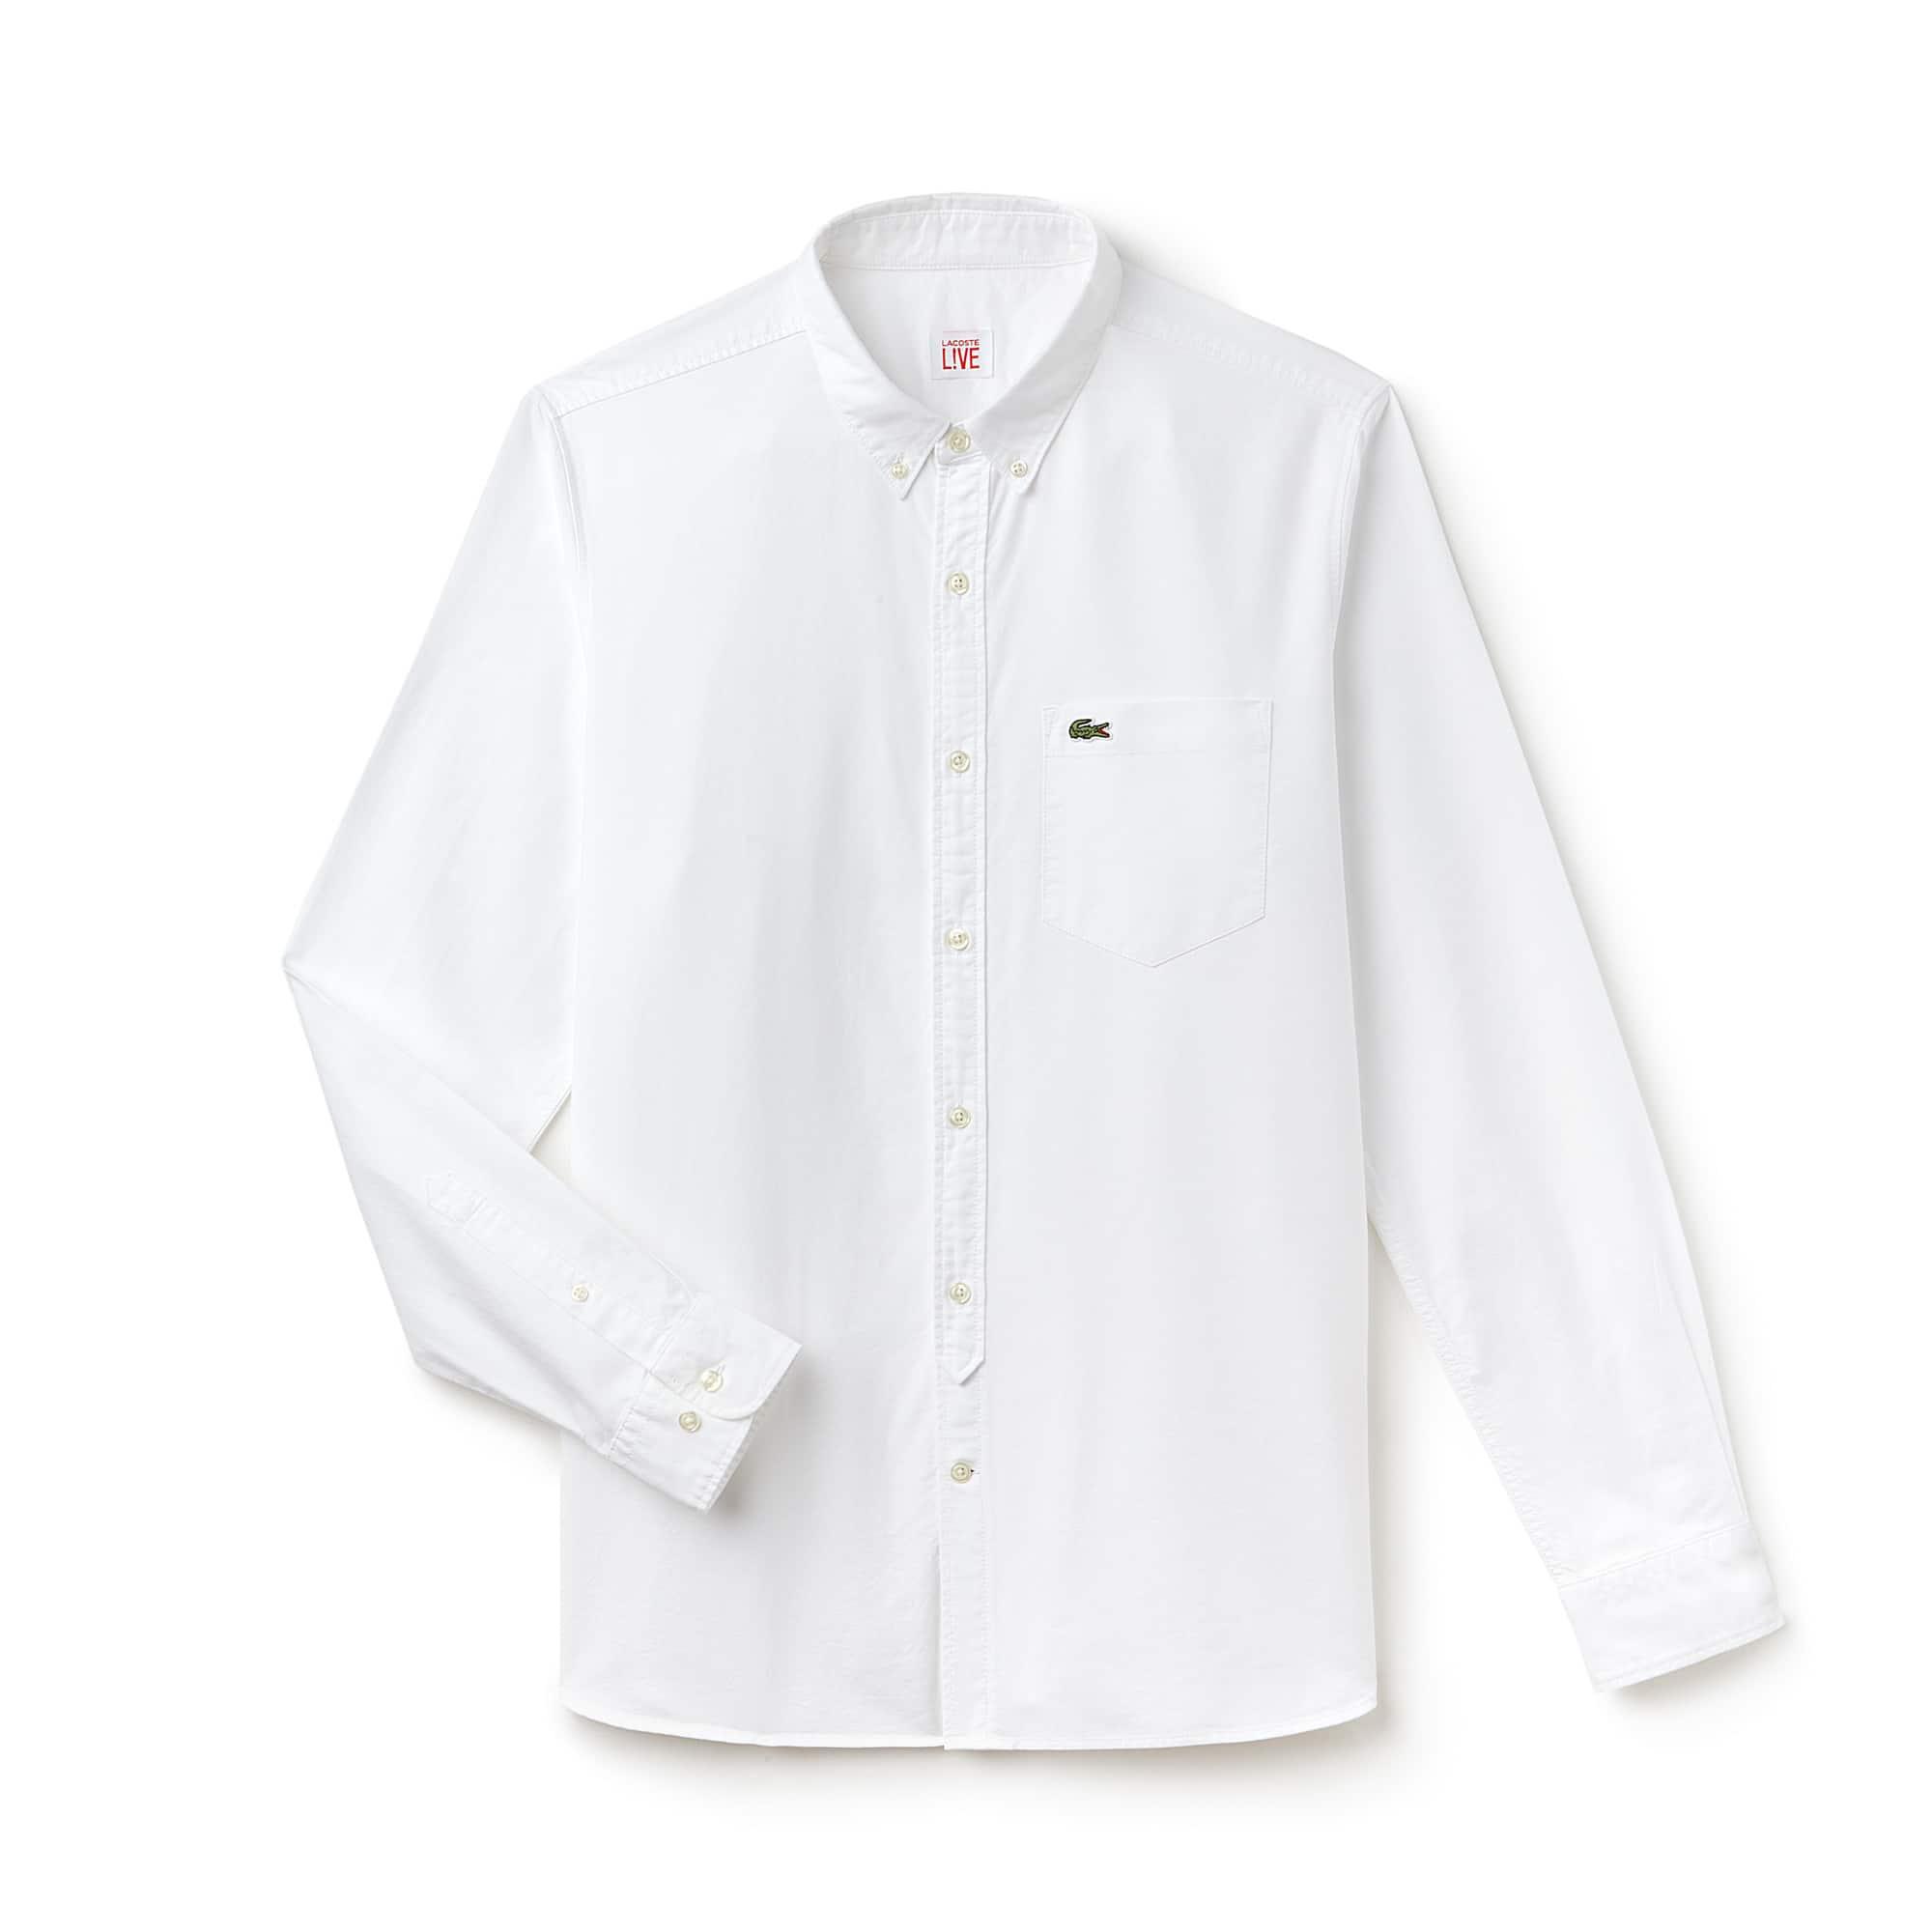 Camisa slim fit Lacoste LIVE de algodón Oxford liso